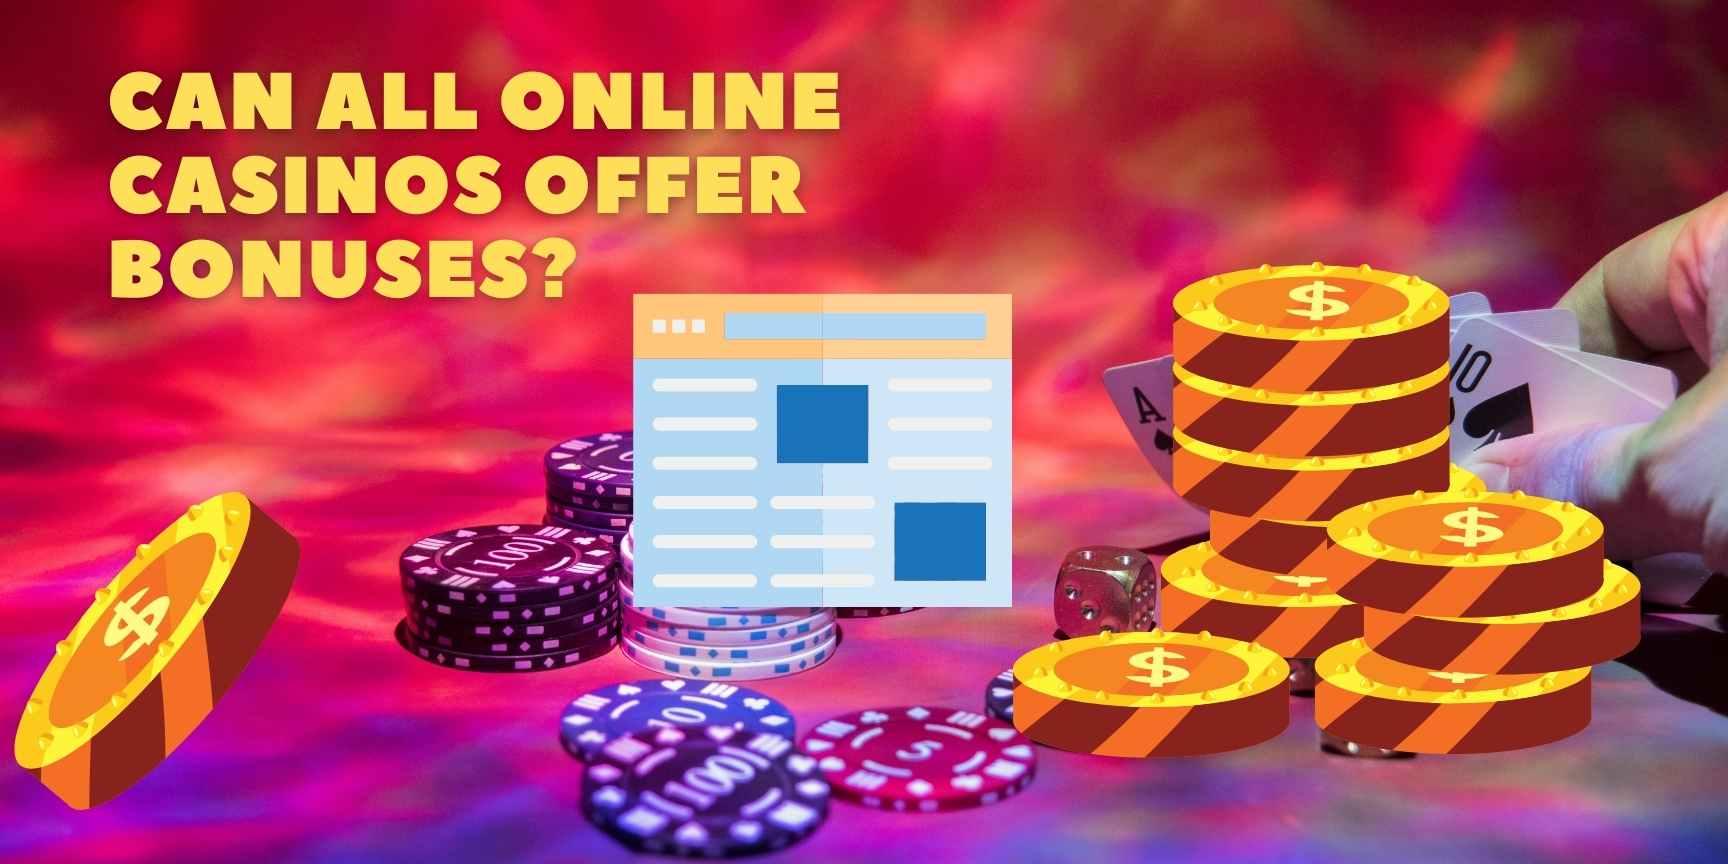 Online casinos offer